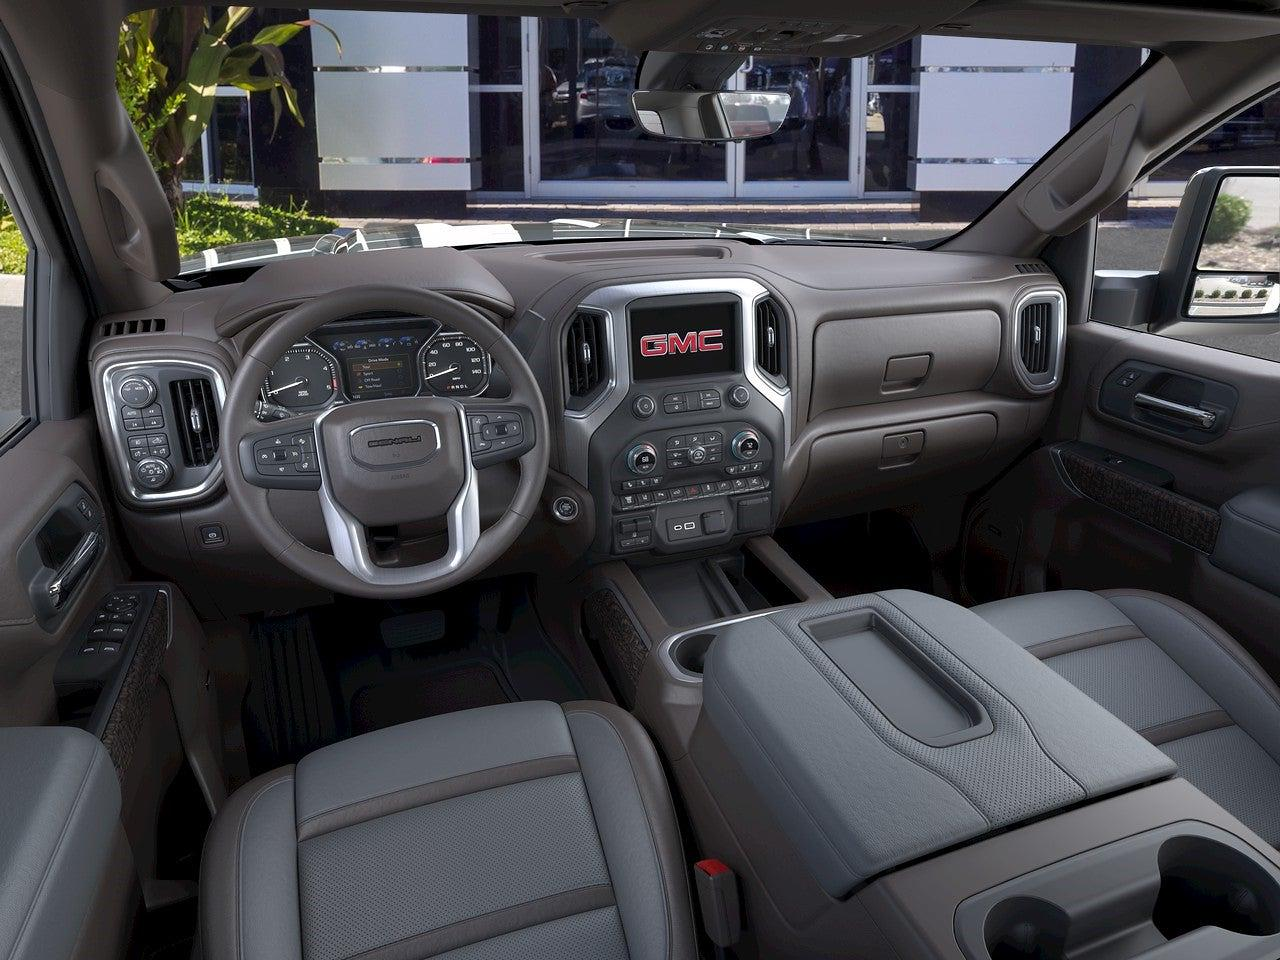 2021 GMC Sierra 2500 Crew Cab 4x4, Pickup #T21306 - photo 32